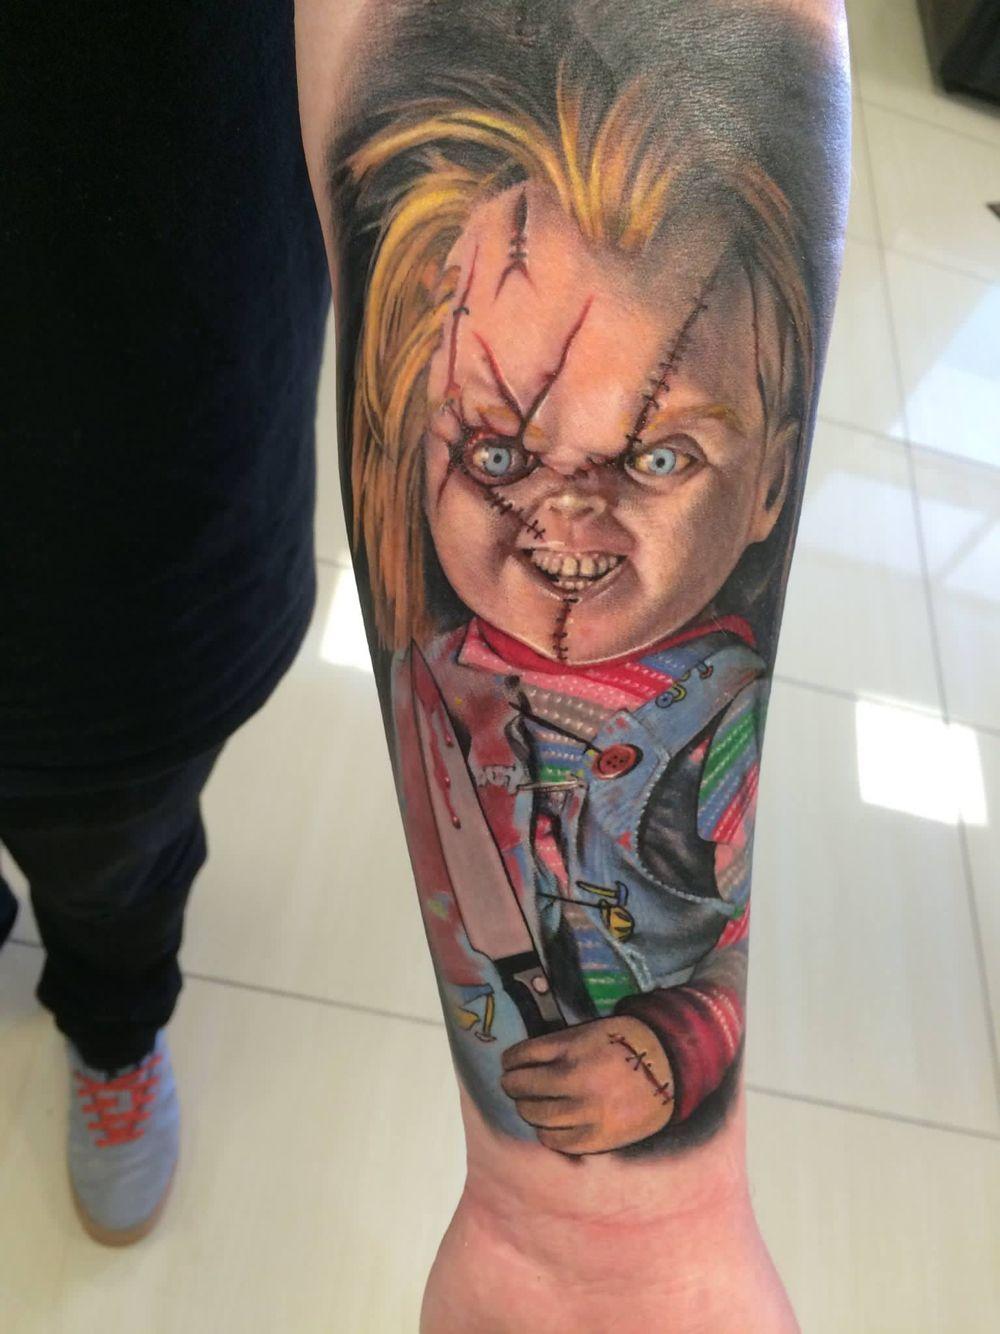 ba9d22a27cd39 Awesome Chucky tattoo | exorcist chuckie tattoo | Chucky tattoo ...